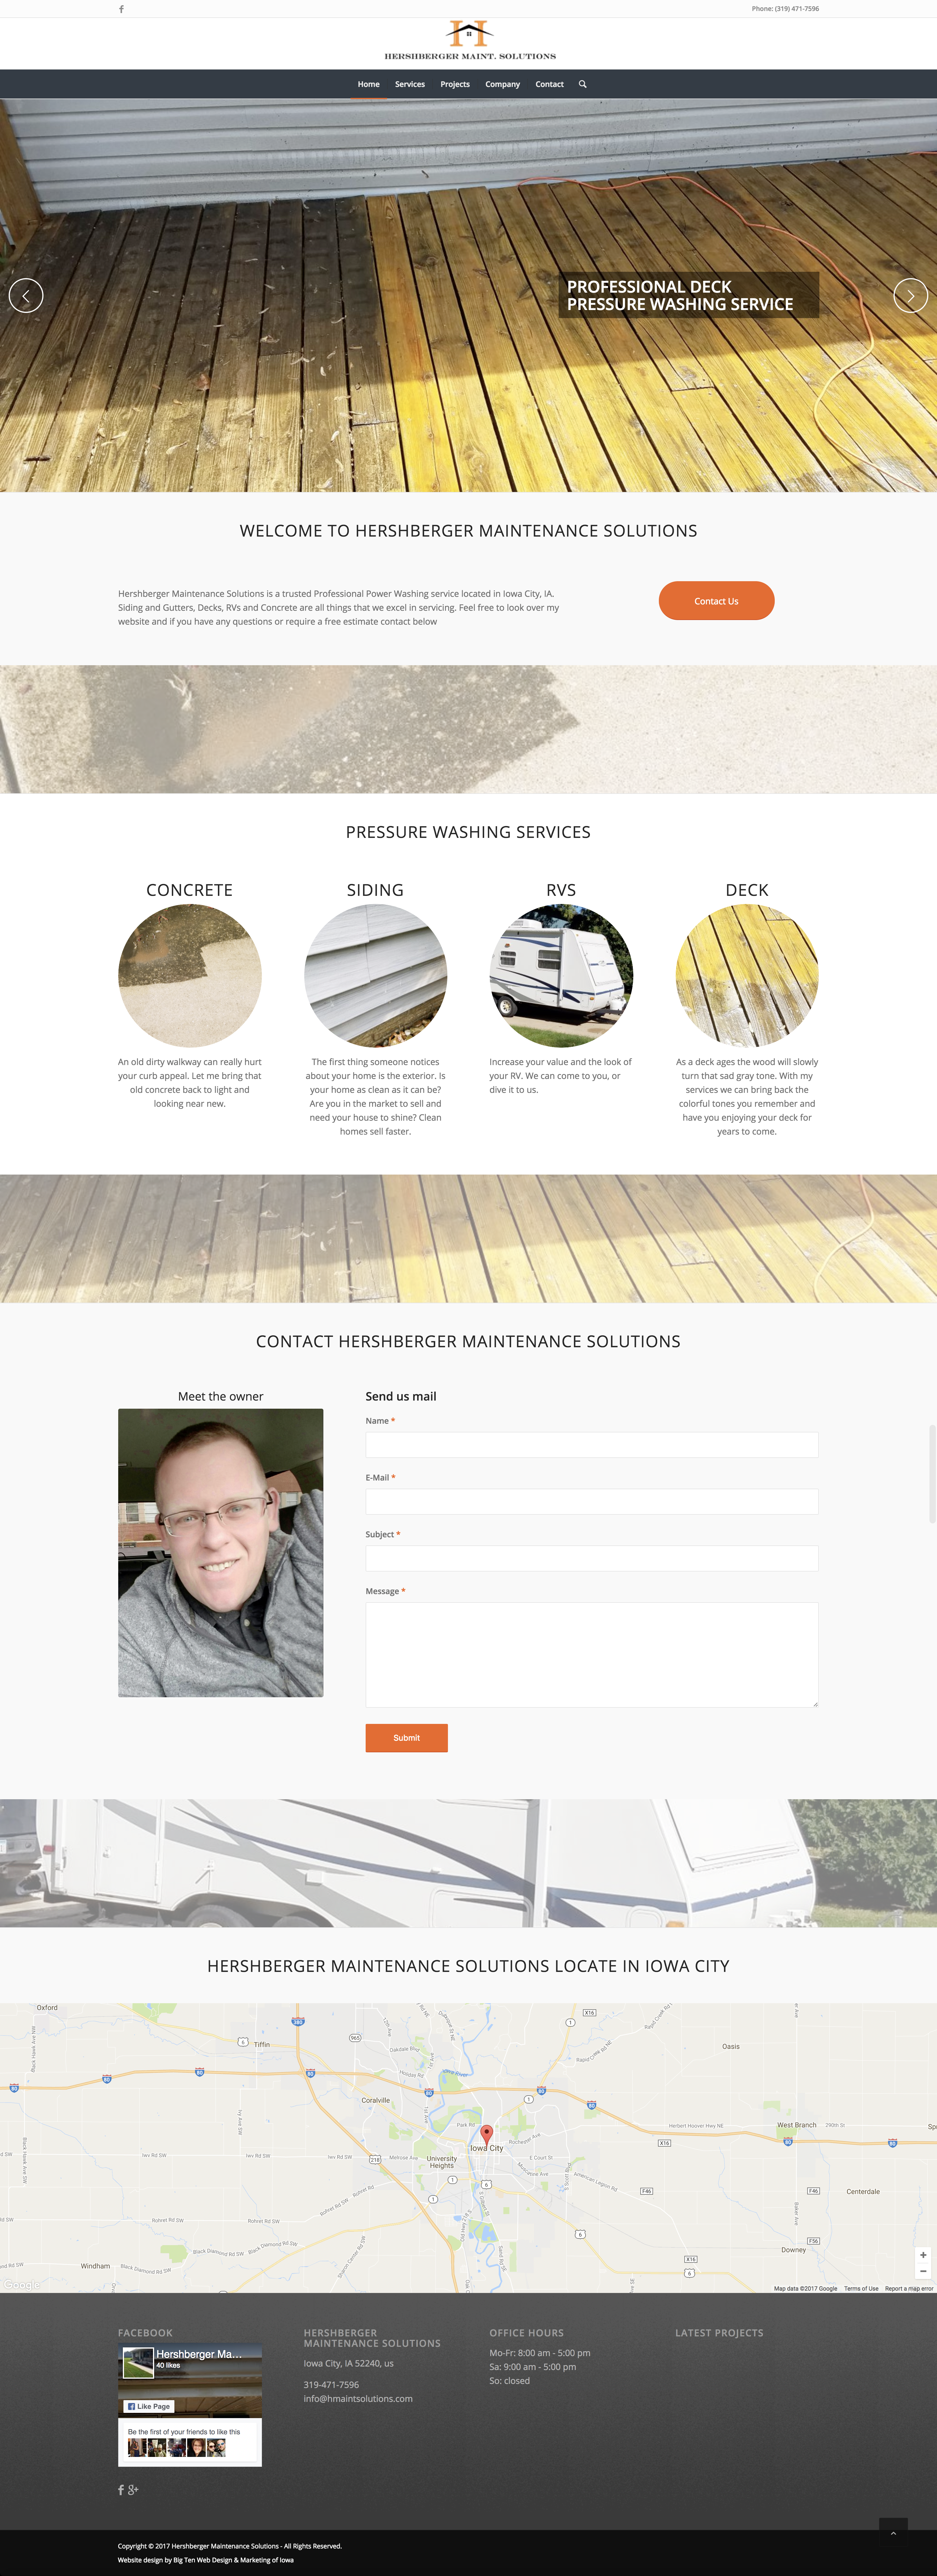 Hershberger Maintenance Solutions website built by Big Ten Web Design with free ssl